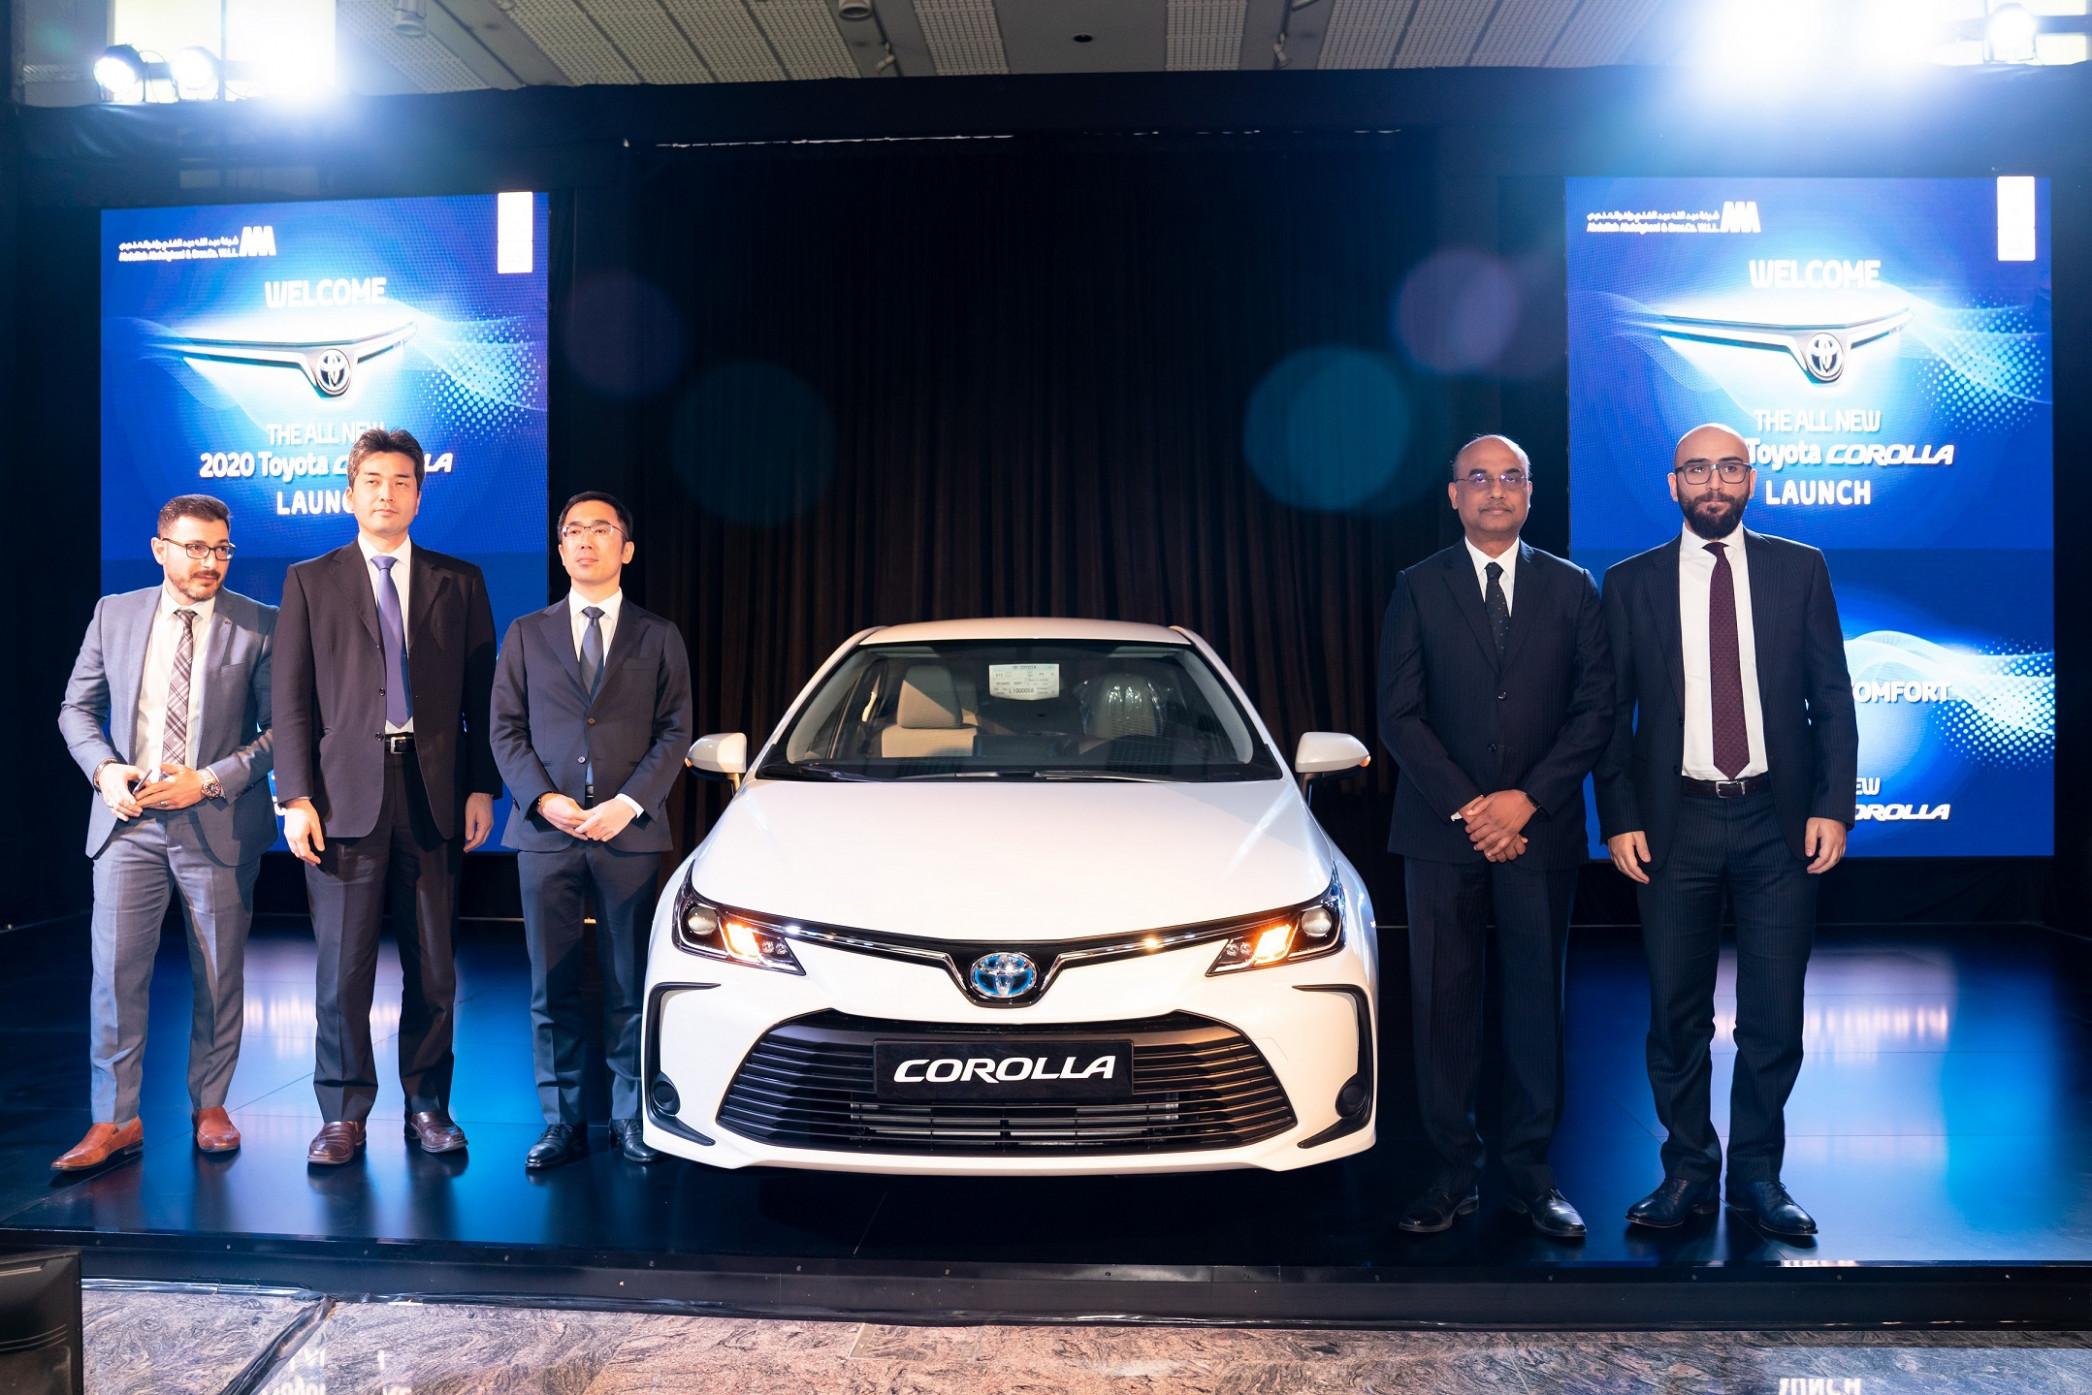 Performance Toyota Corolla 2022 Qatar